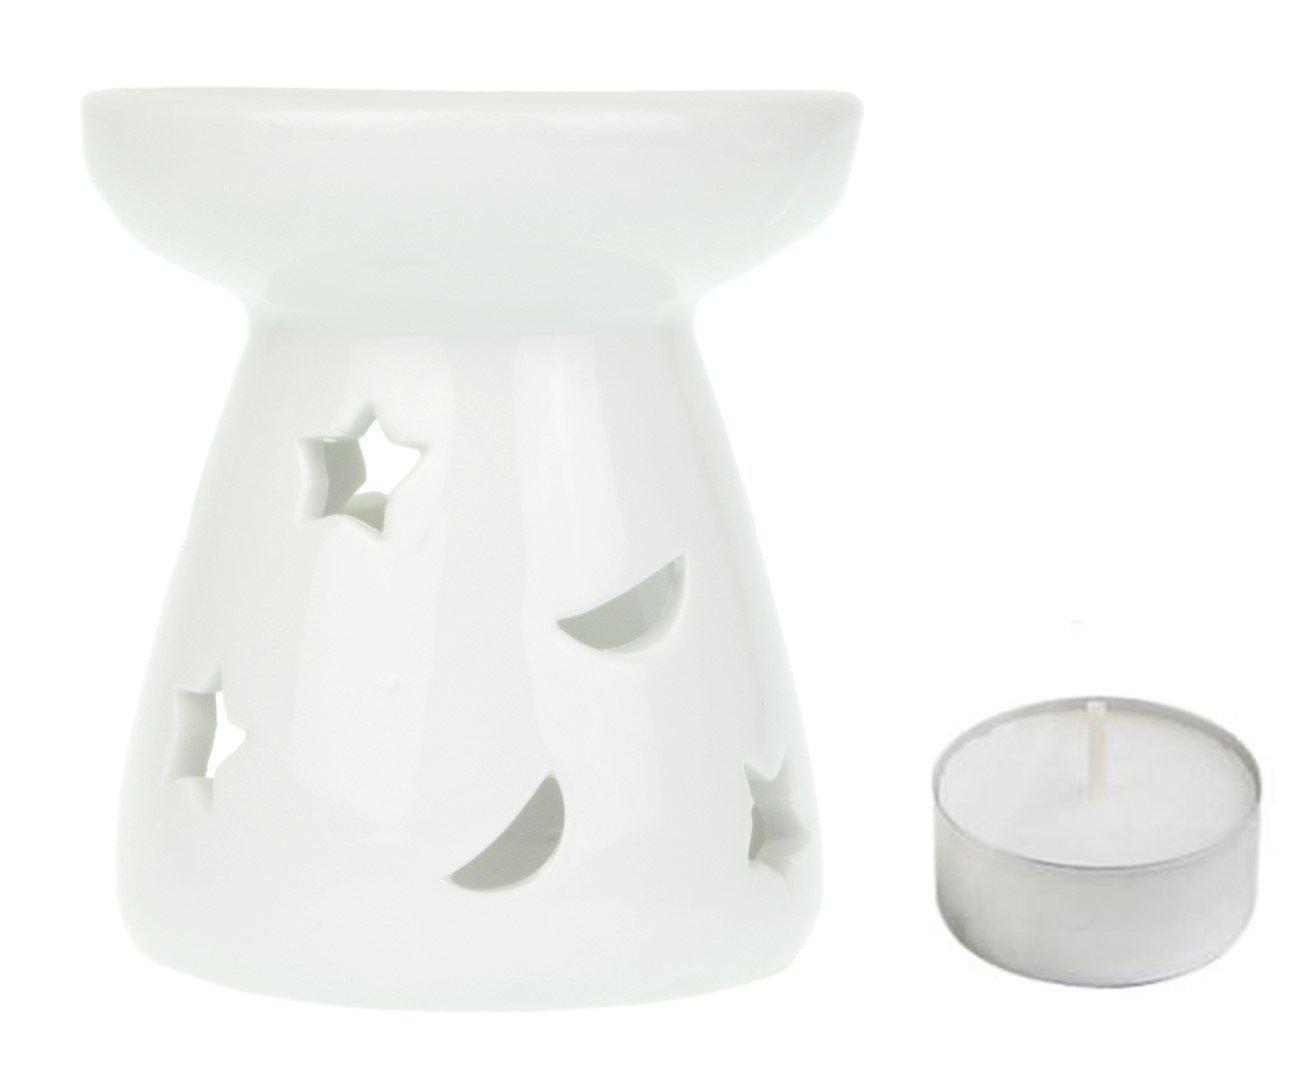 Profumo lampada luna & stelle con lumino–Ceramica–Bianco–9cm Ancient Wisdom